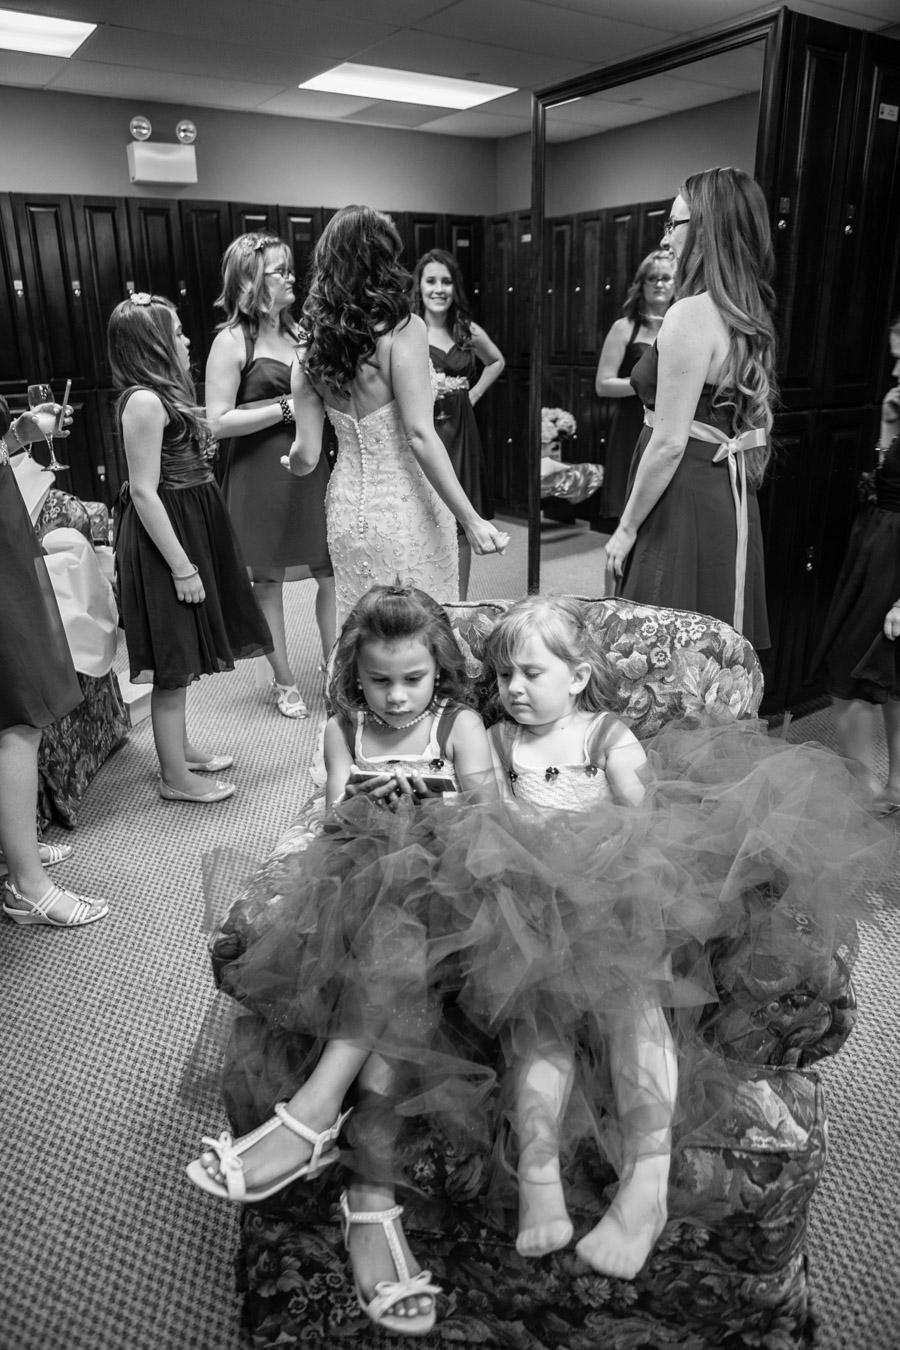 NEPA_Pocono_Weddings_Rob_Lettieri_Photography_03.jpg